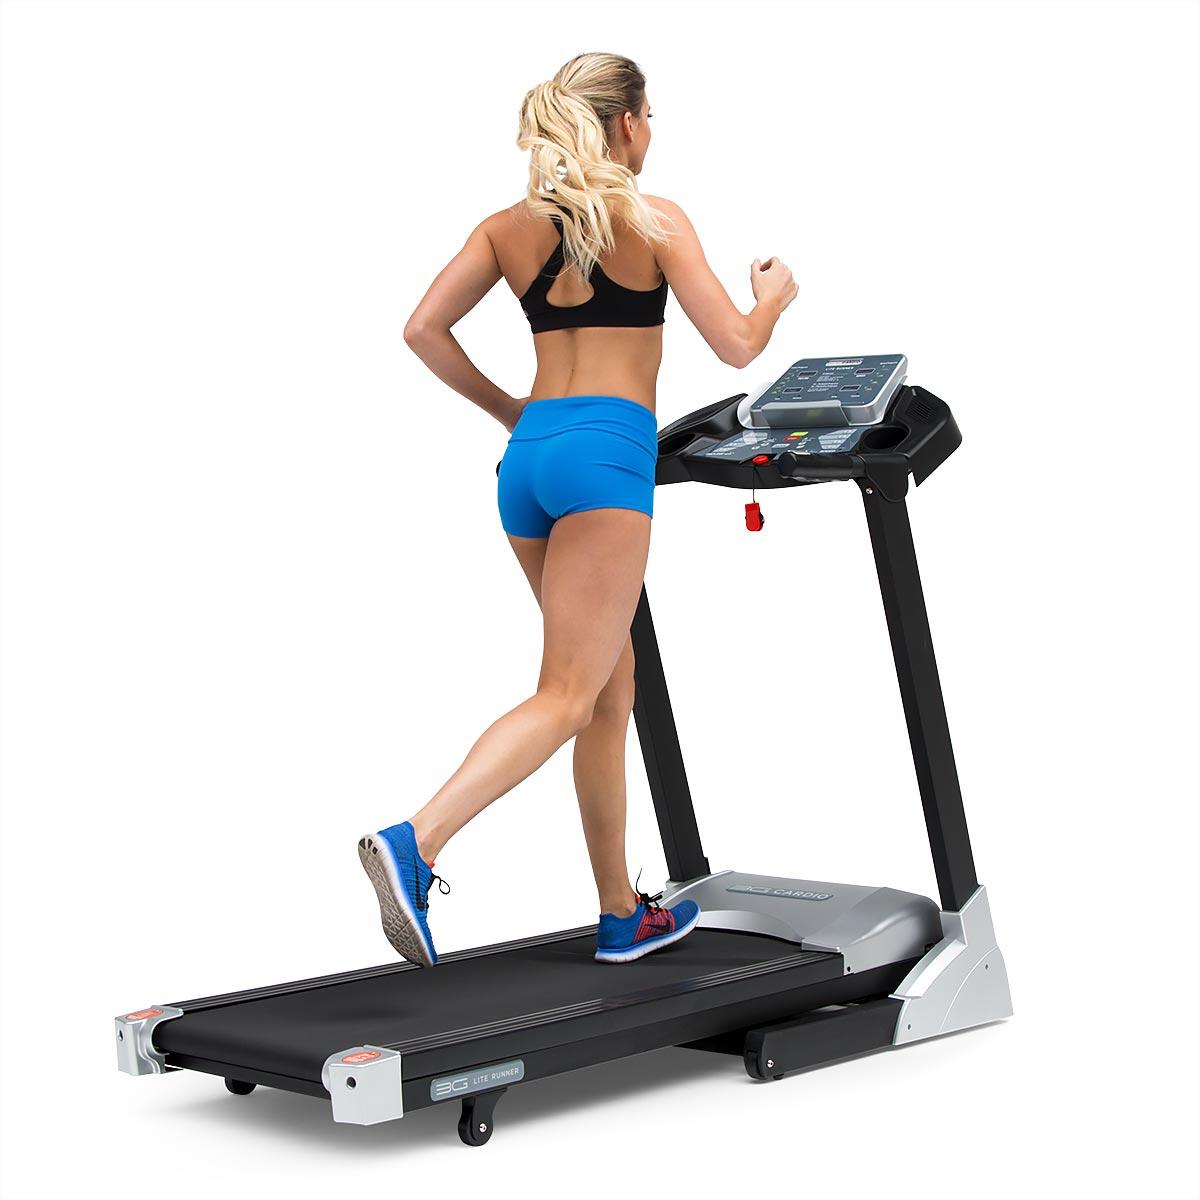 G cardio lite runner treadmill at home fitness